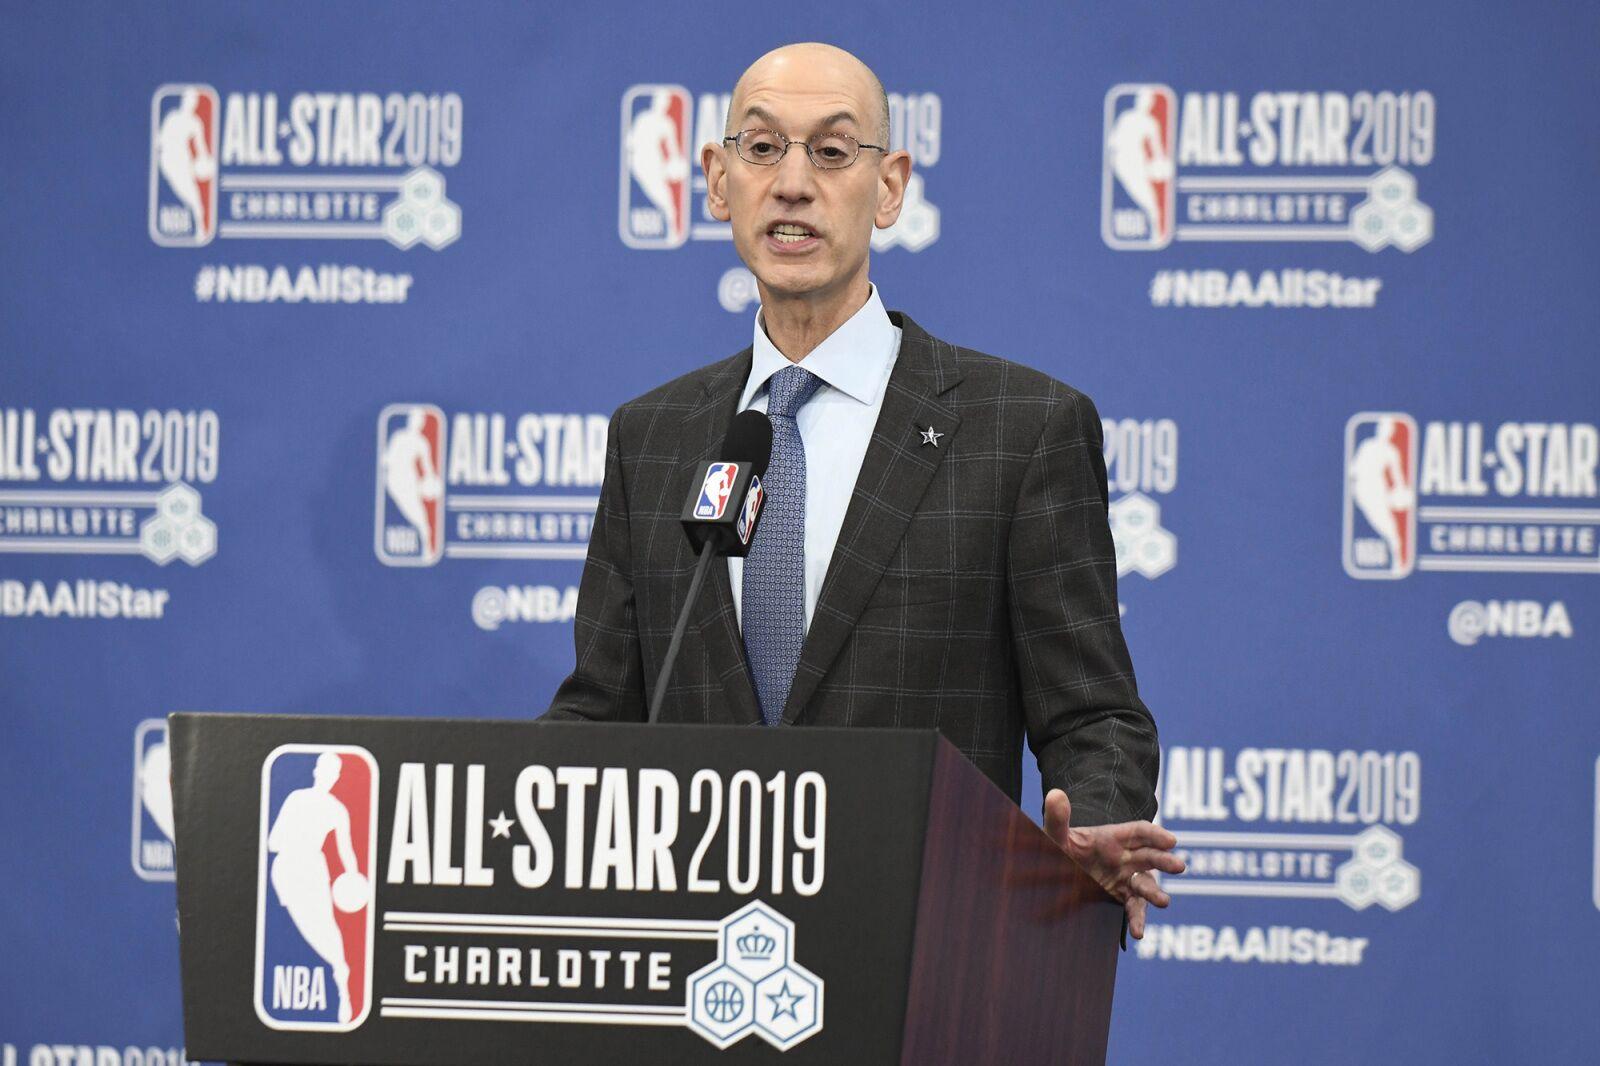 Los Angeles Lakers: Should NBA intervene with organization?